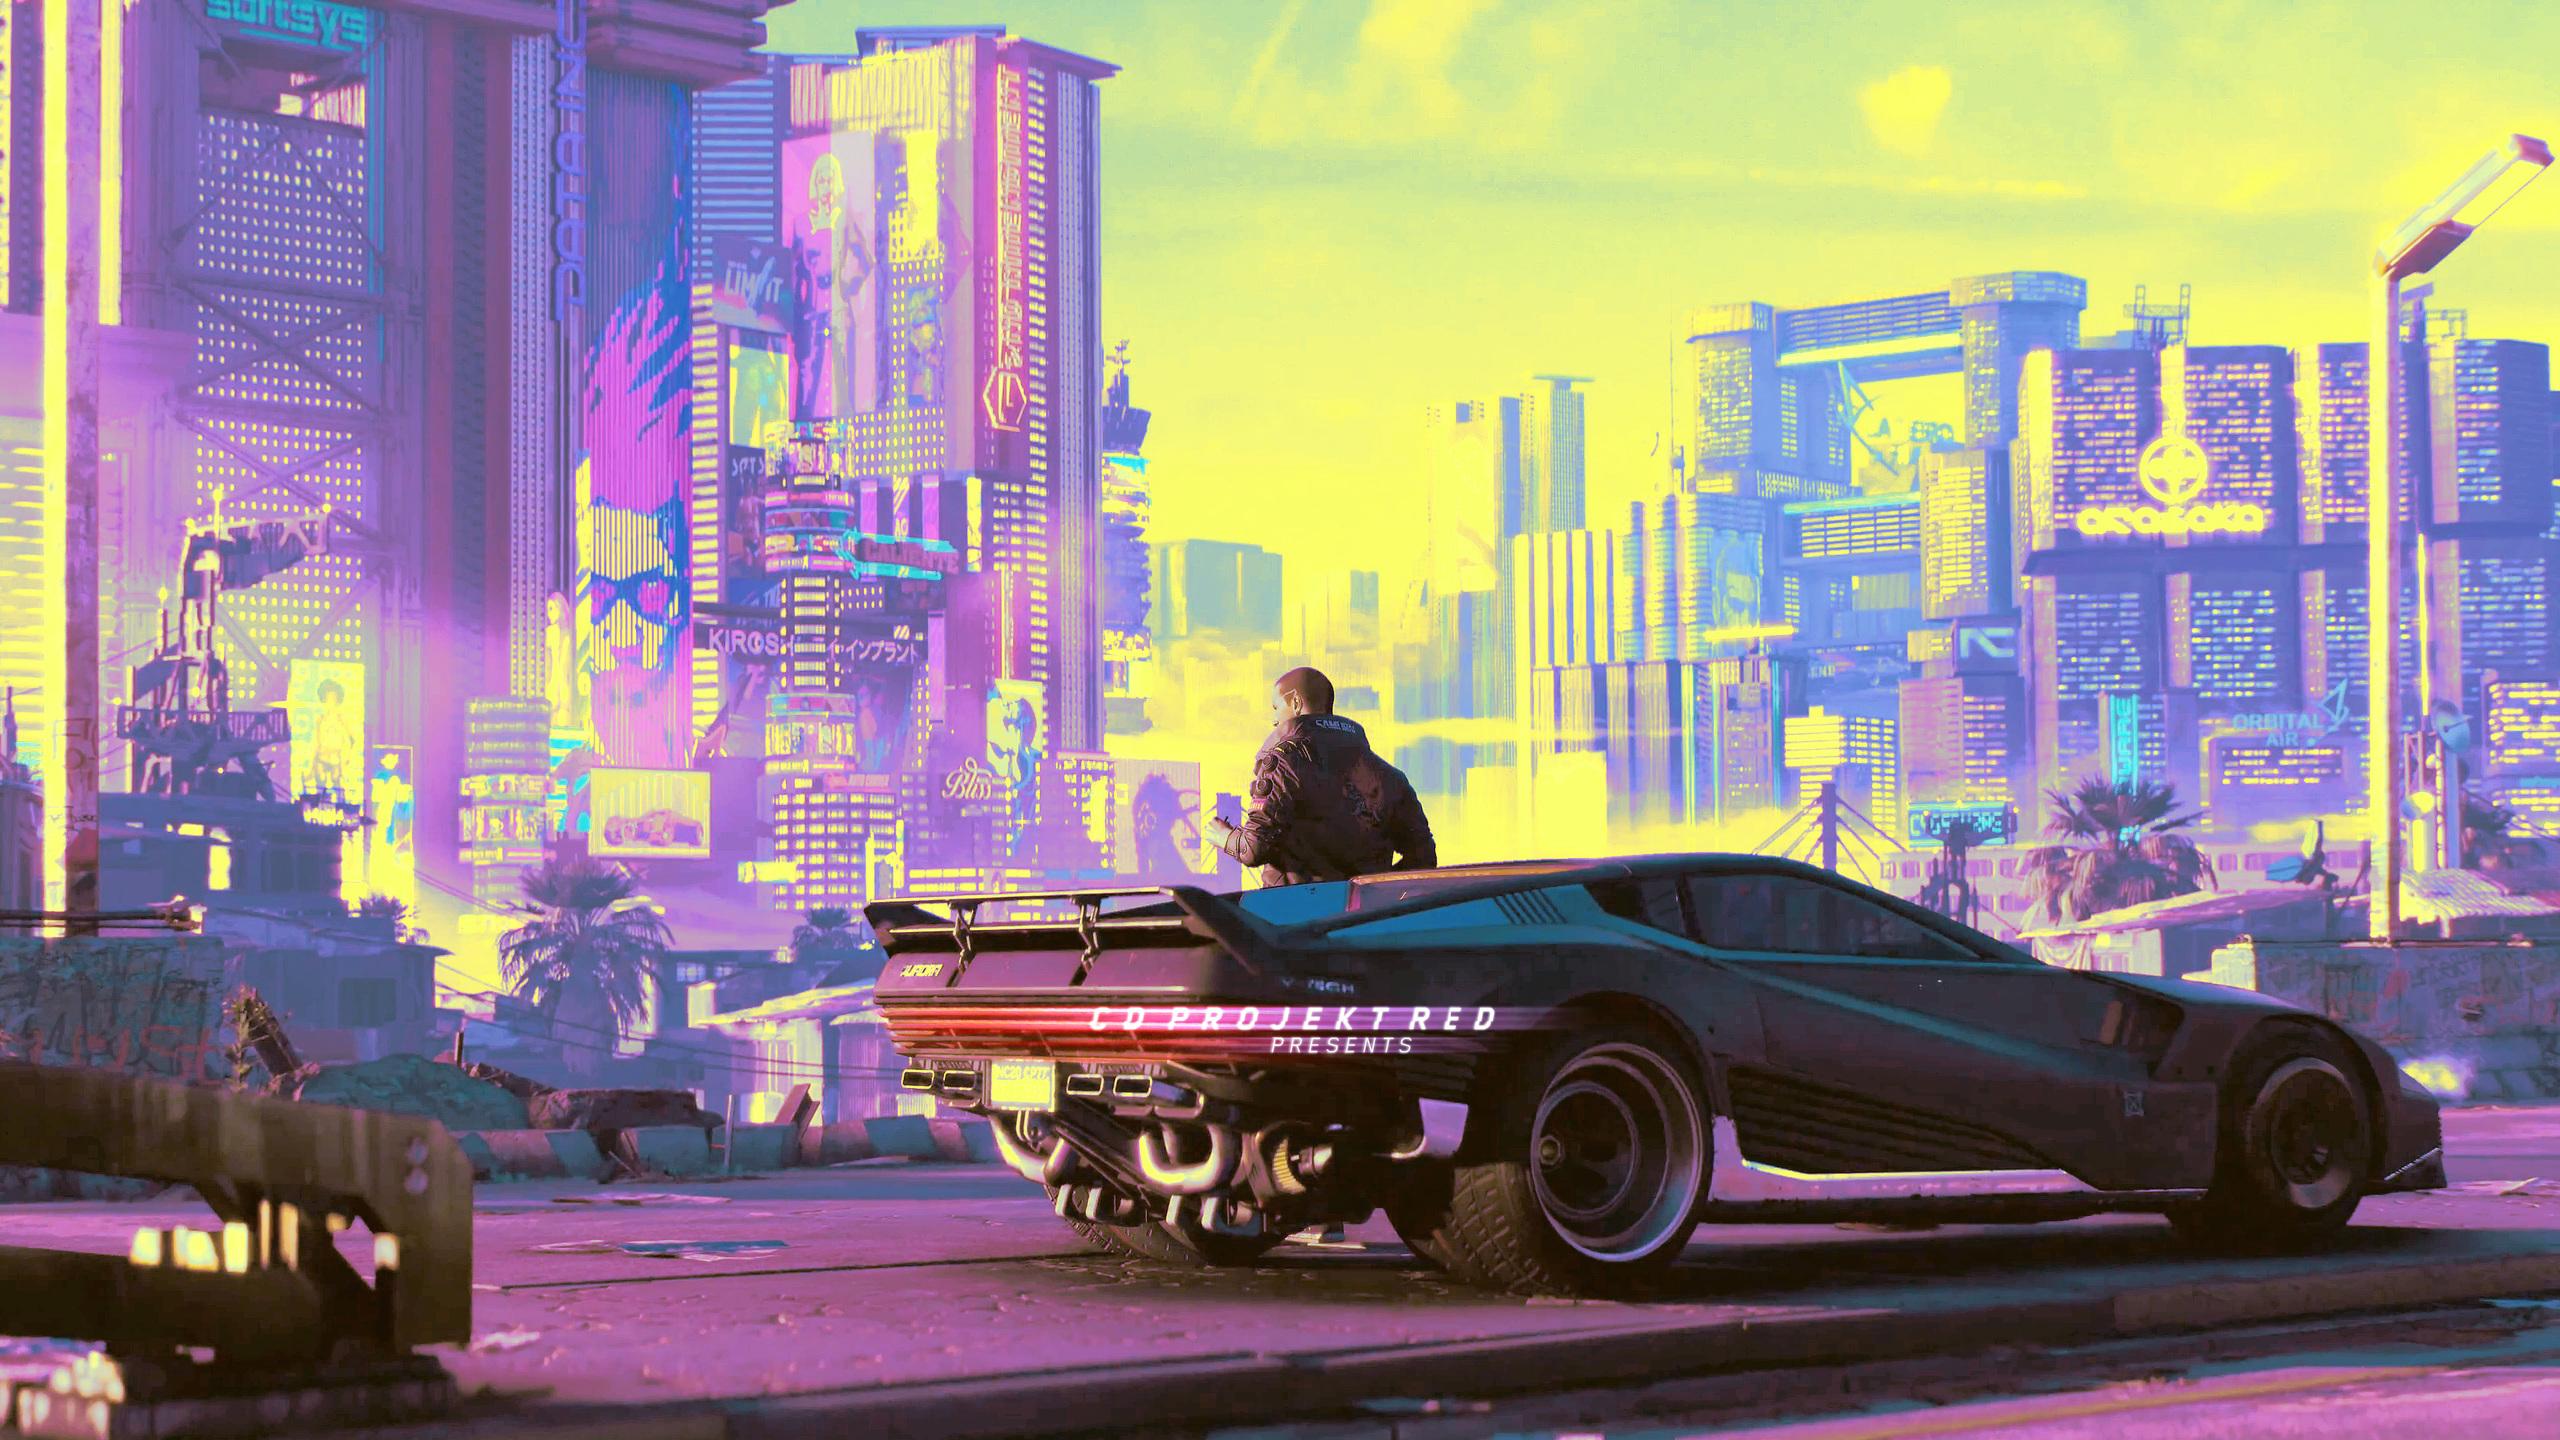 Hd Cyberpunk June 2018